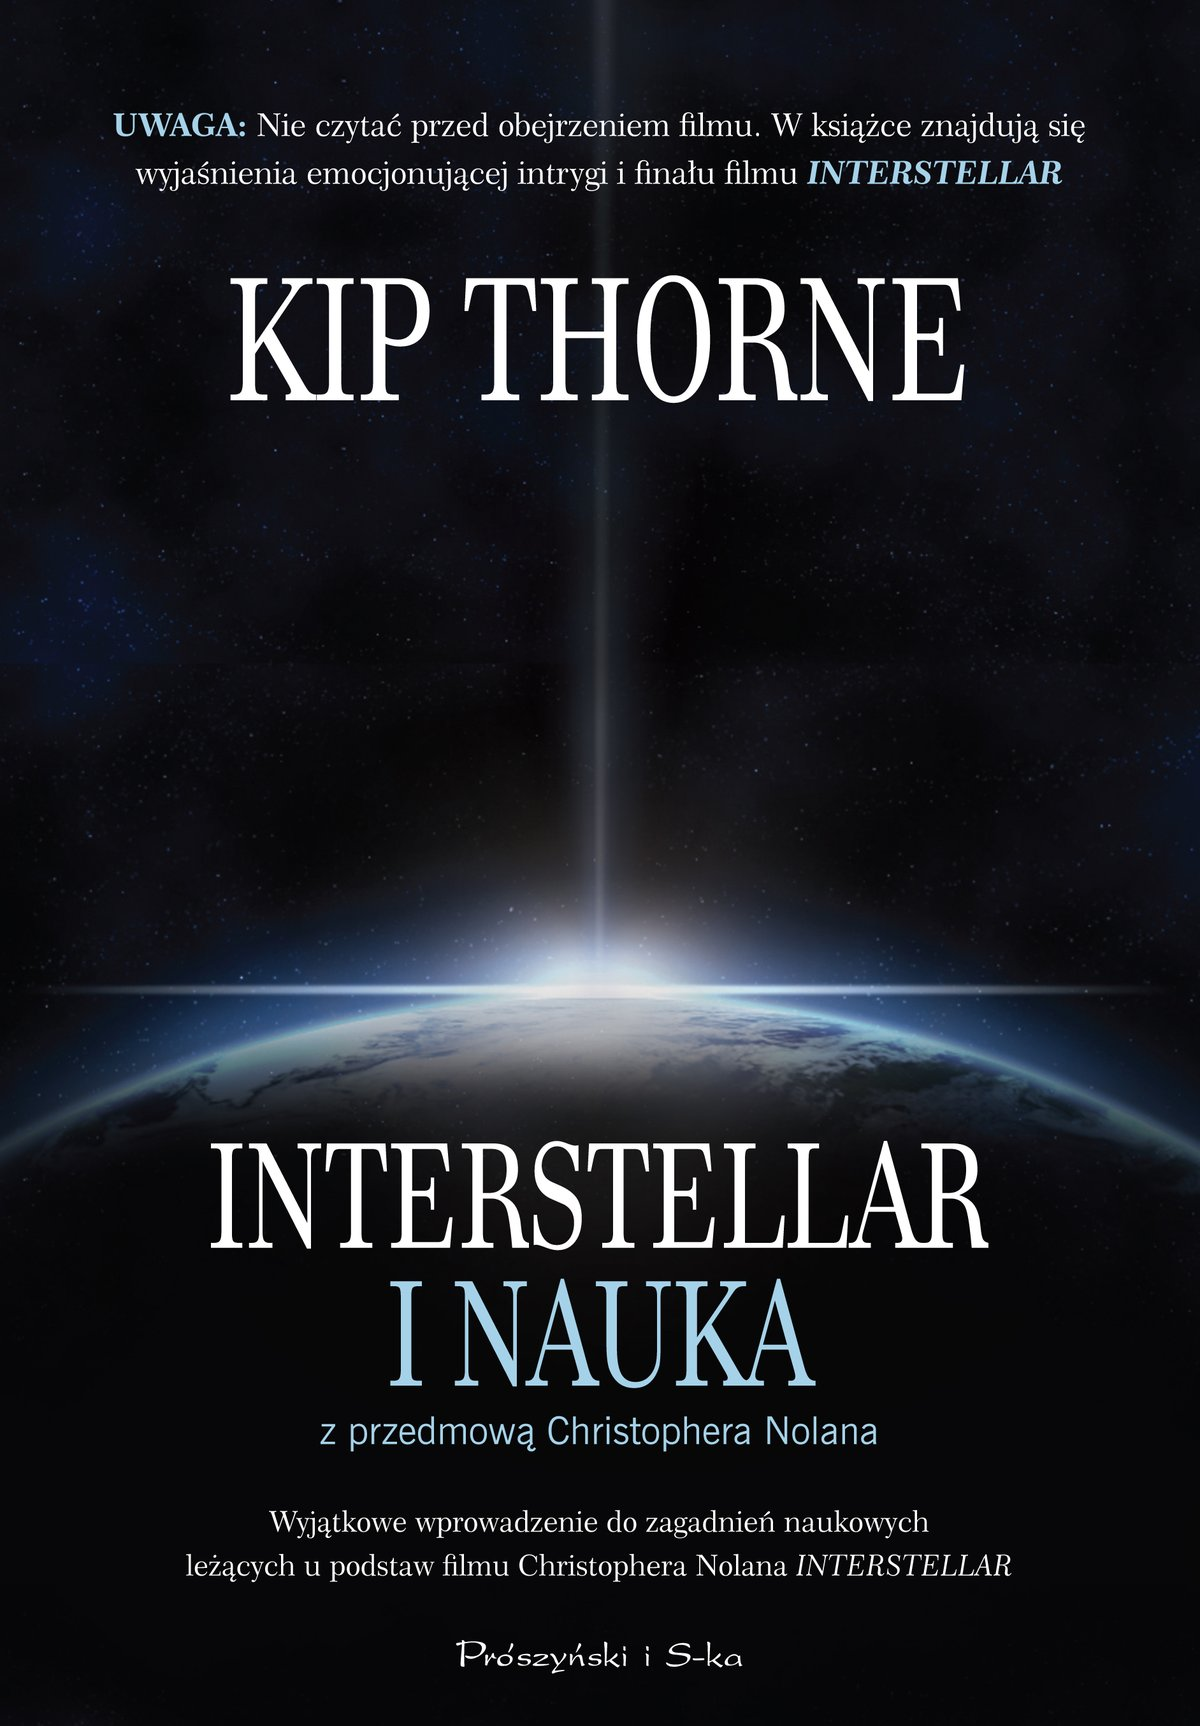 Interstellar i nauka - Ebook (Książka na Kindle) do pobrania w formacie MOBI